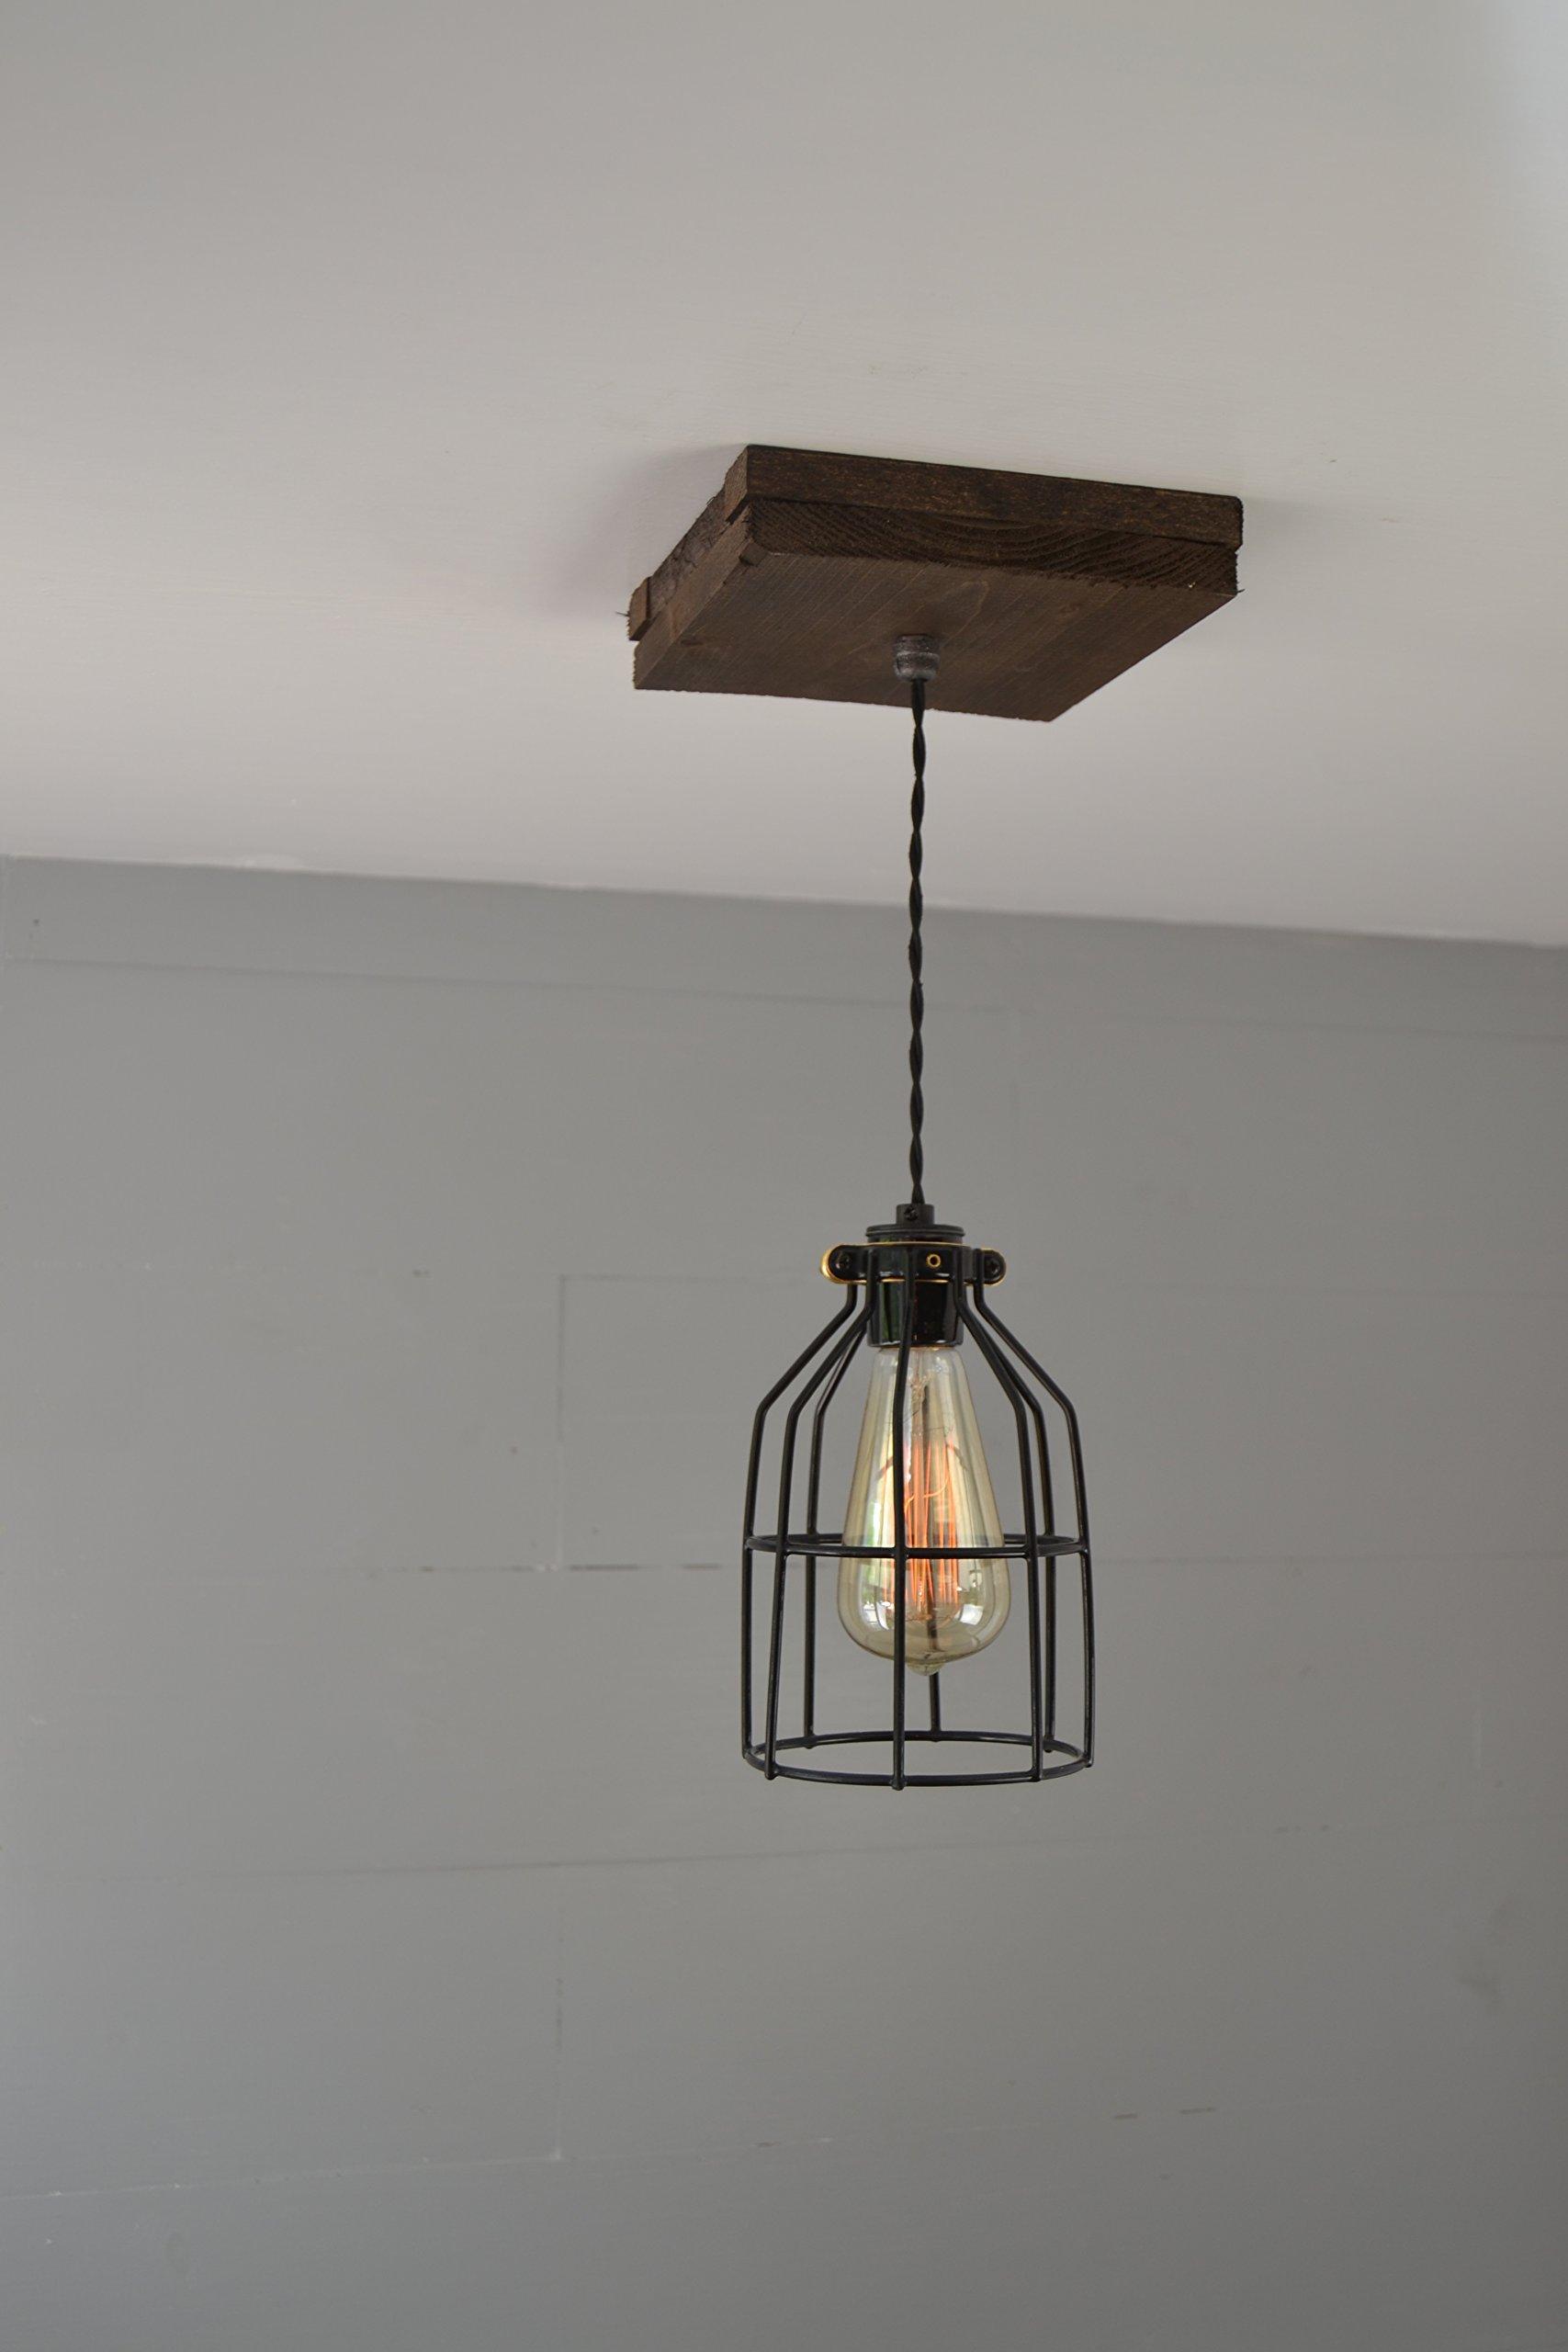 West Ninth Vintage Flushed Wood Pendant Farmhouse Fixture   w/ Metal Cage Light by West Ninth Vintage (Image #3)